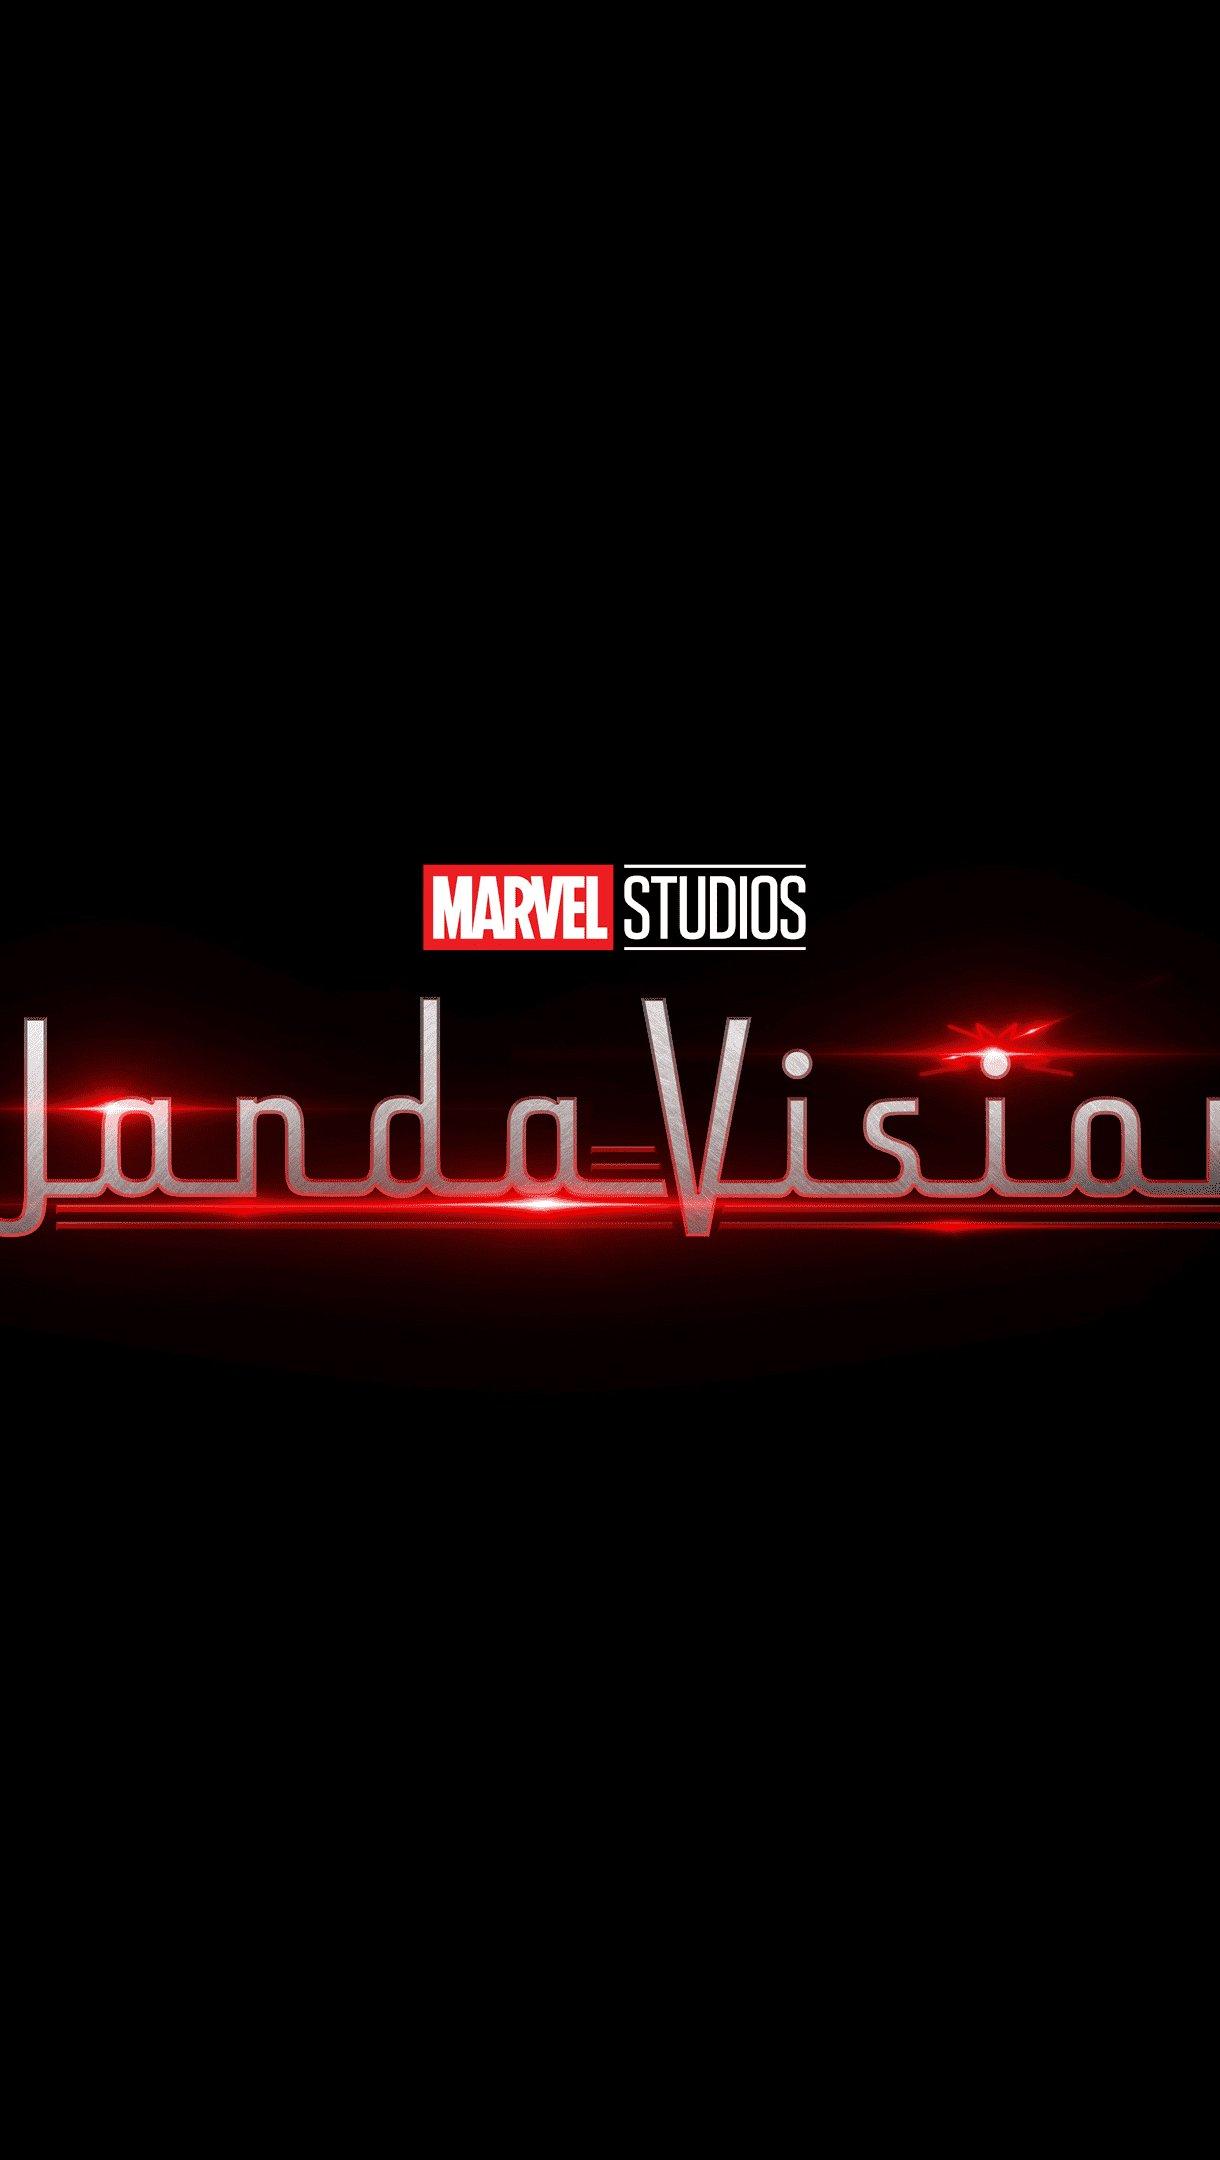 Fondos de pantalla Marvel Studios WandaVision Vertical